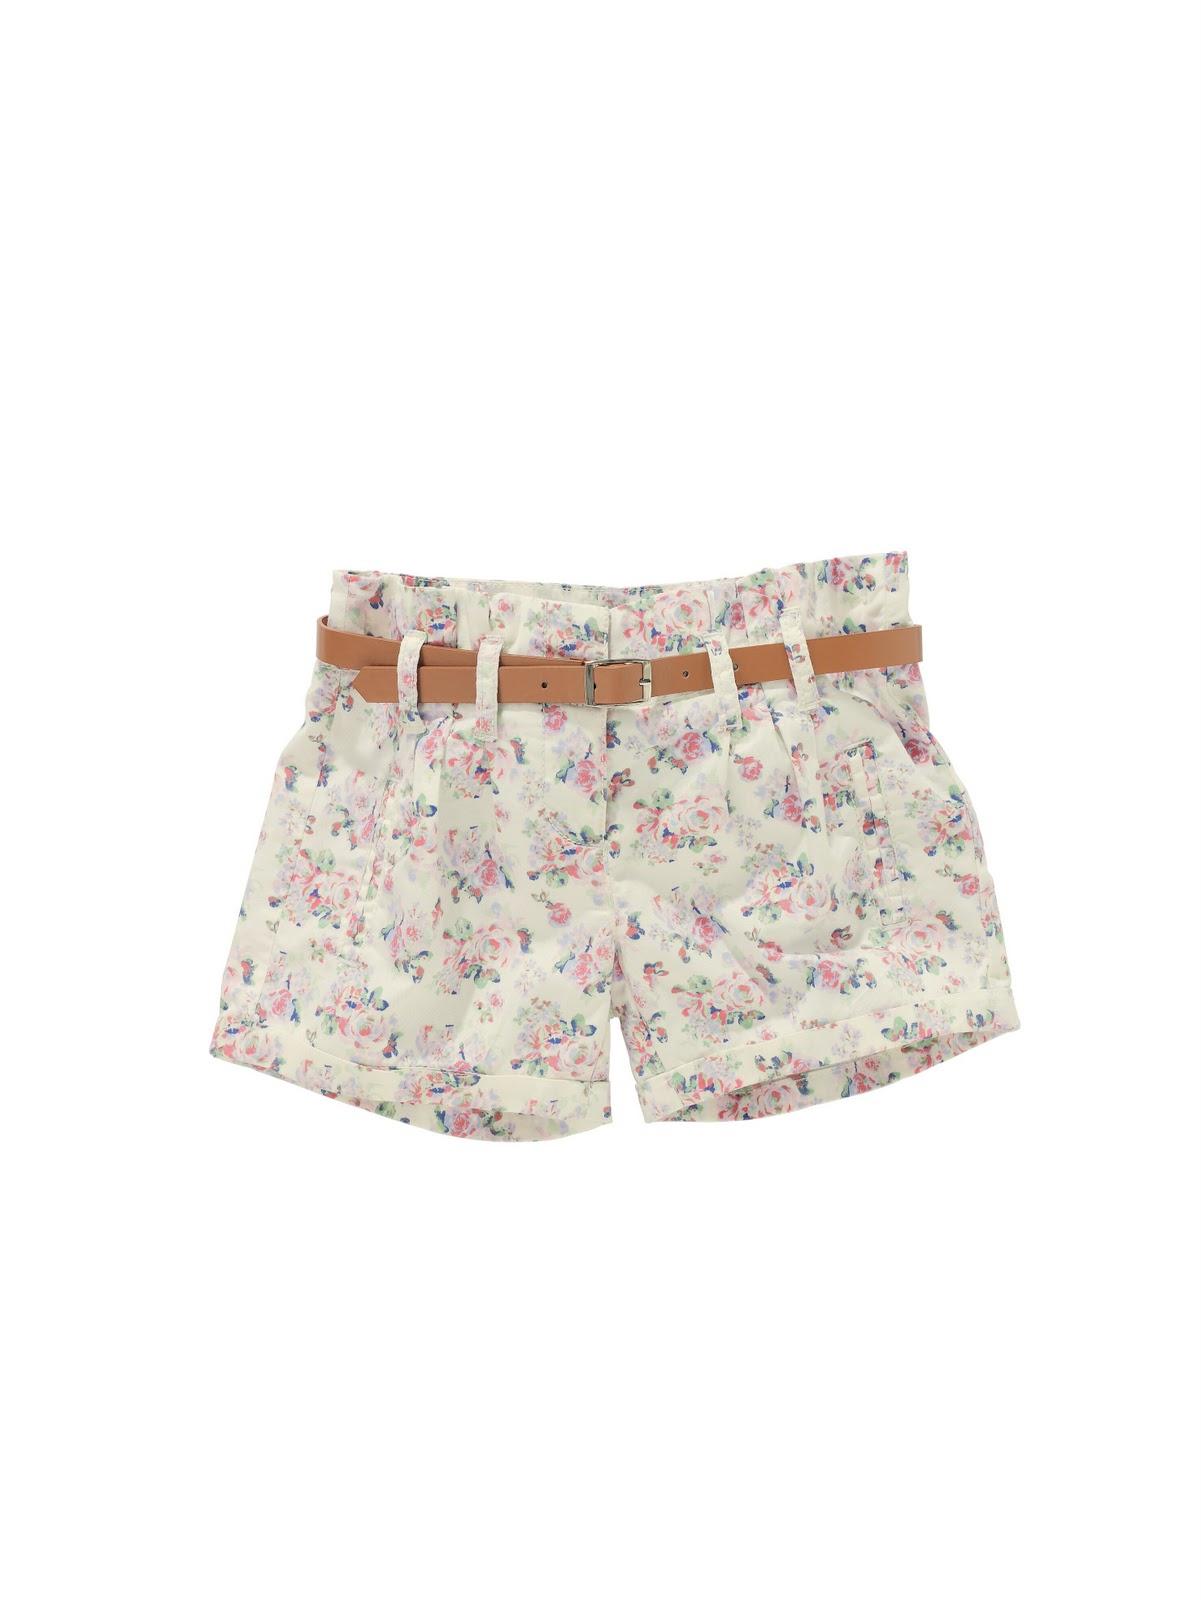 http://1.bp.blogspot.com/_ZLGKT36MBjw/TT_-ixawzII/AAAAAAAAAAY/wtRDoyWyNyo/s1600/Floral+shorts+Next.jpg